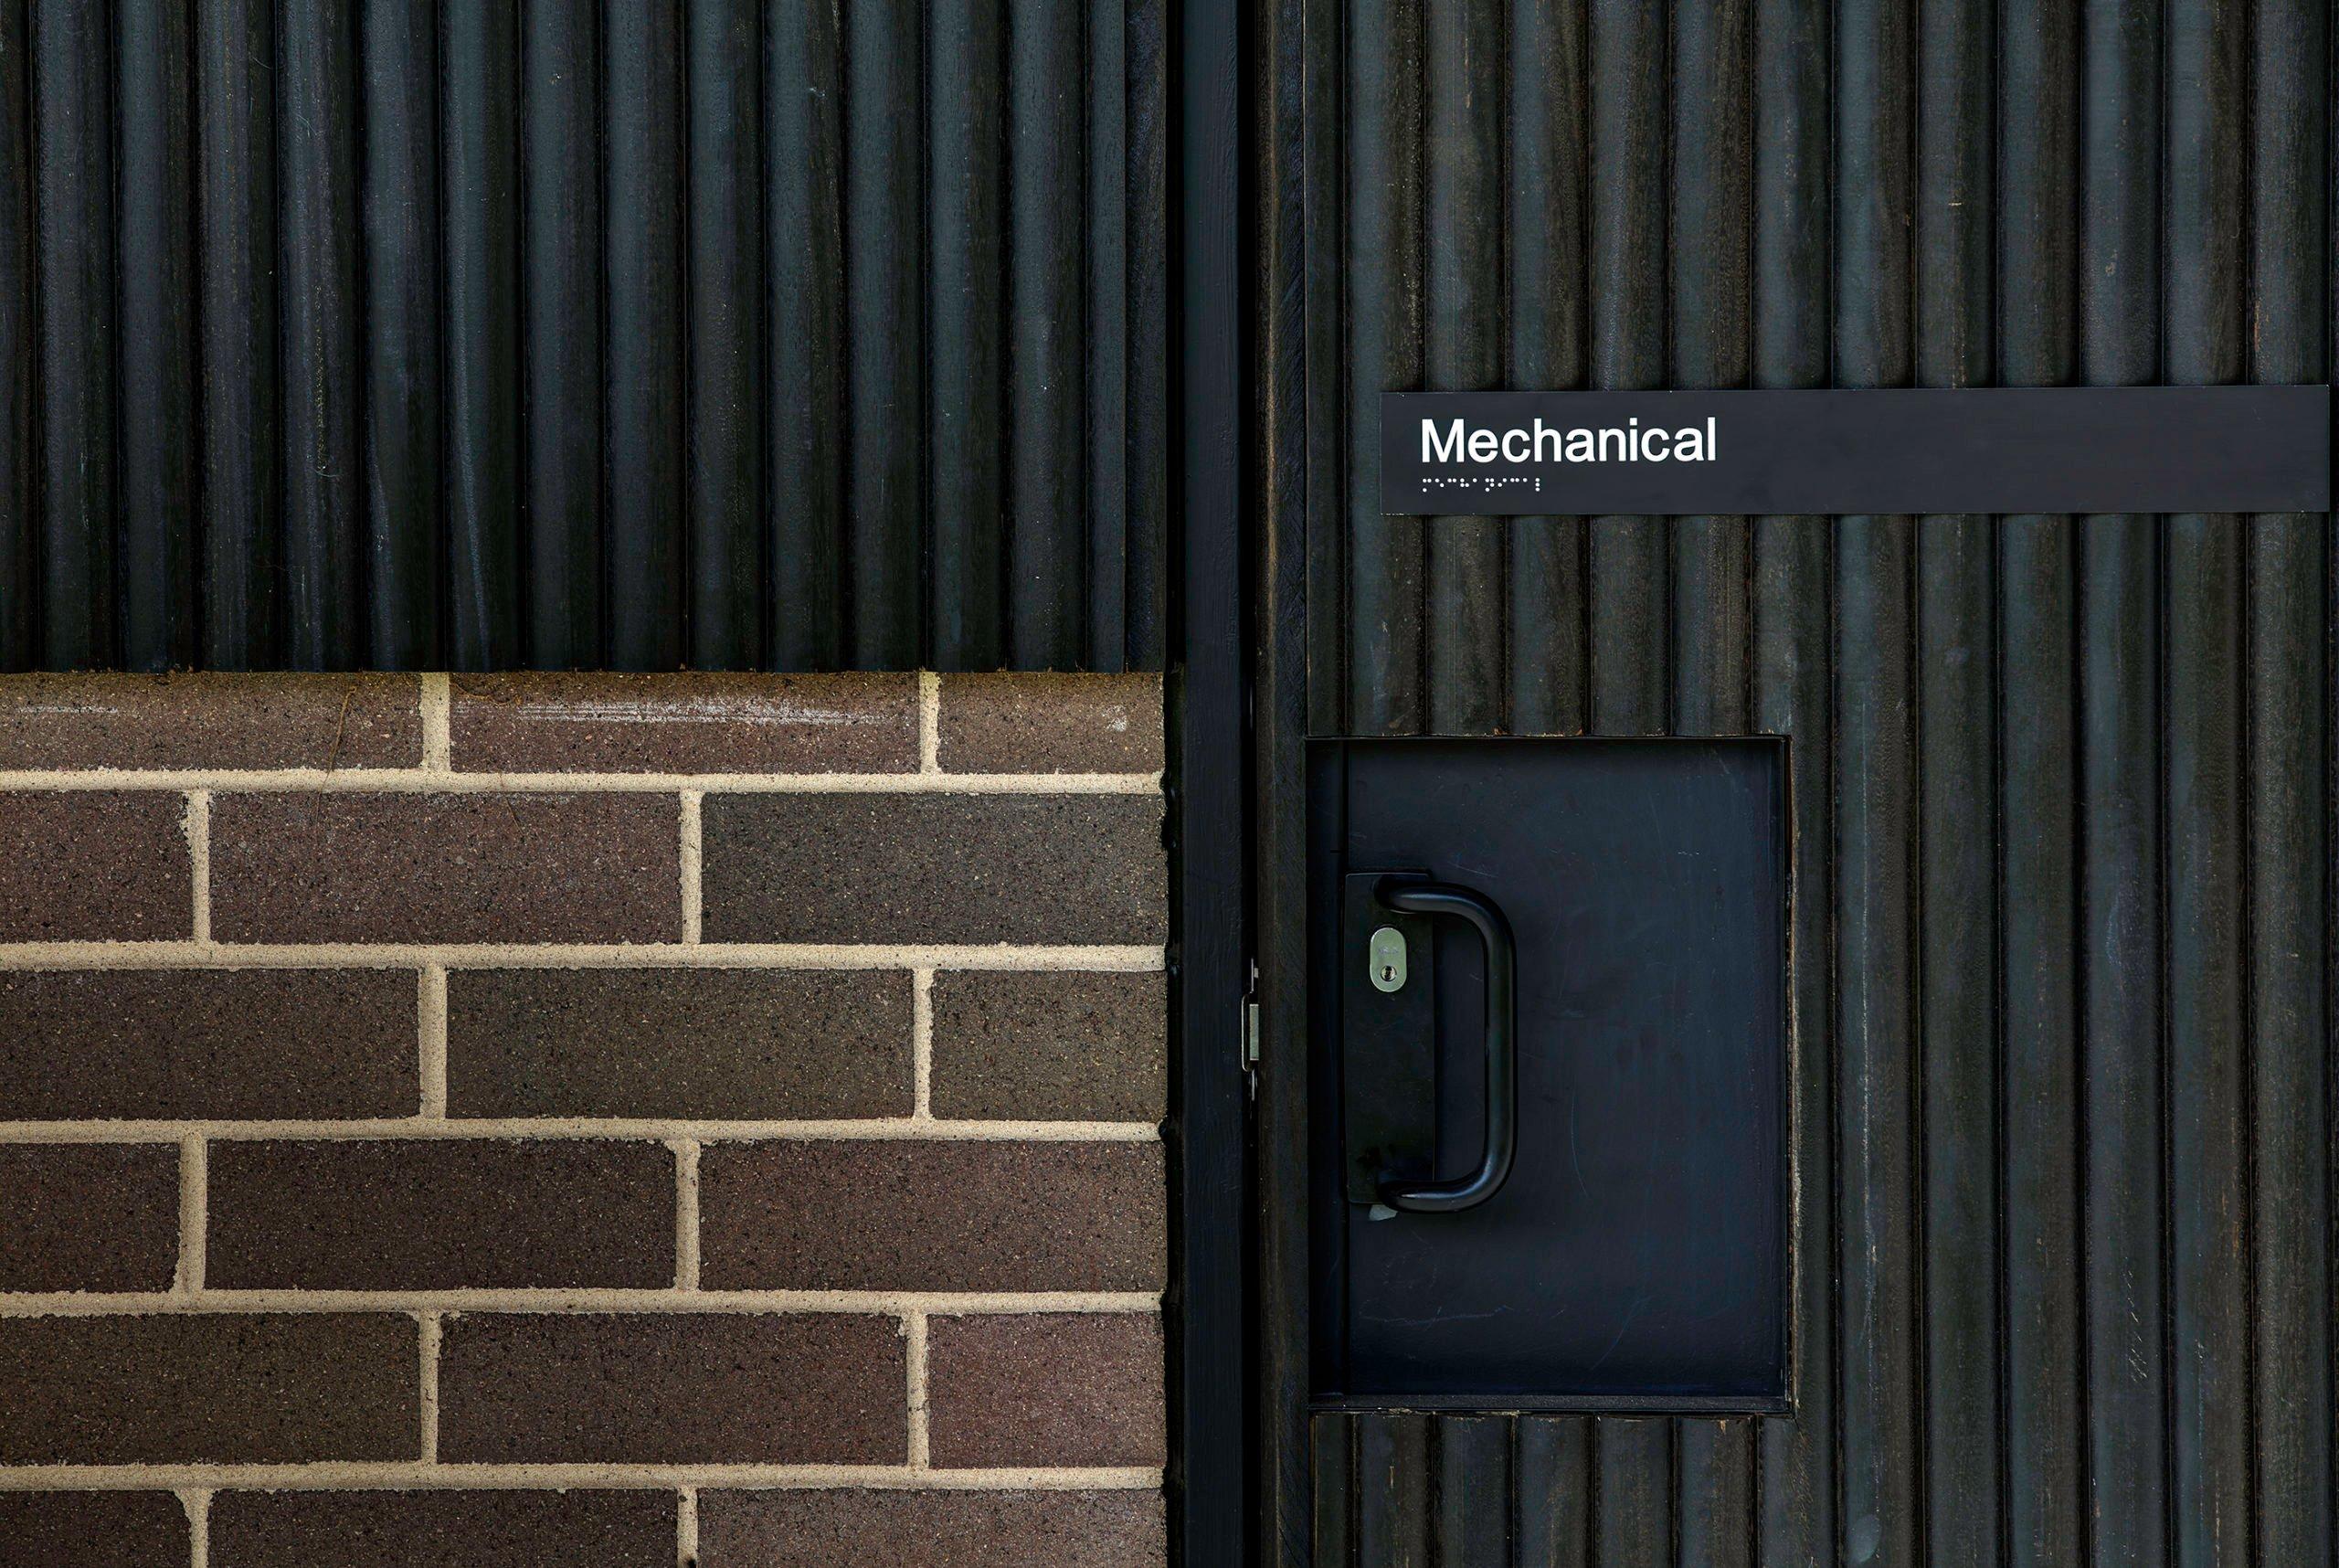 CARTERWILLIAMSON_PHOTO-Brett-Broadman_WoodcroftCommunityCentre_Endure-Cladding-Close-Up-2-scaled